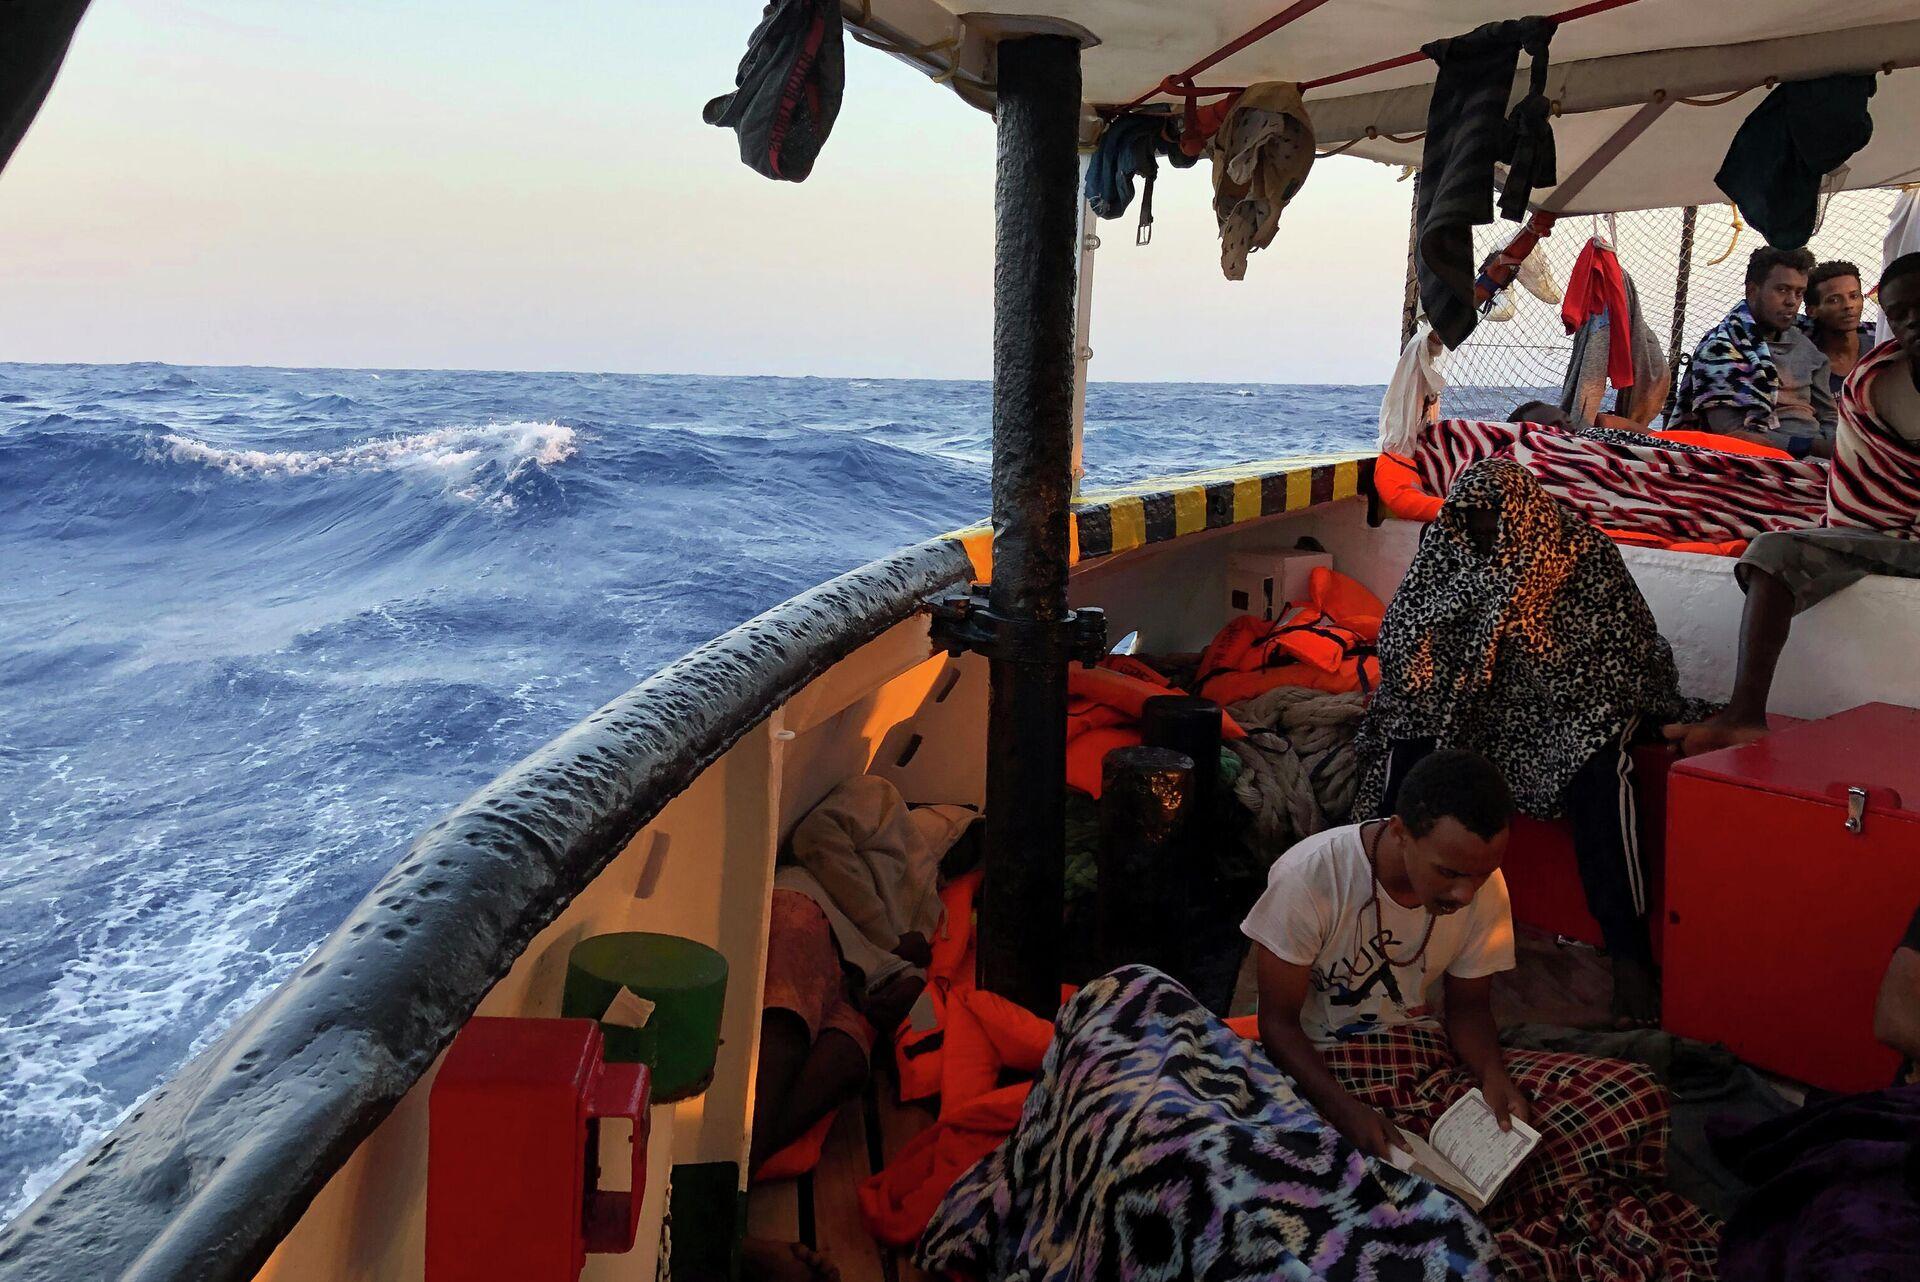 Мигрант читает Коран на борту судна испанских спасателей Open Arms   - РИА Новости, 1920, 13.11.2020